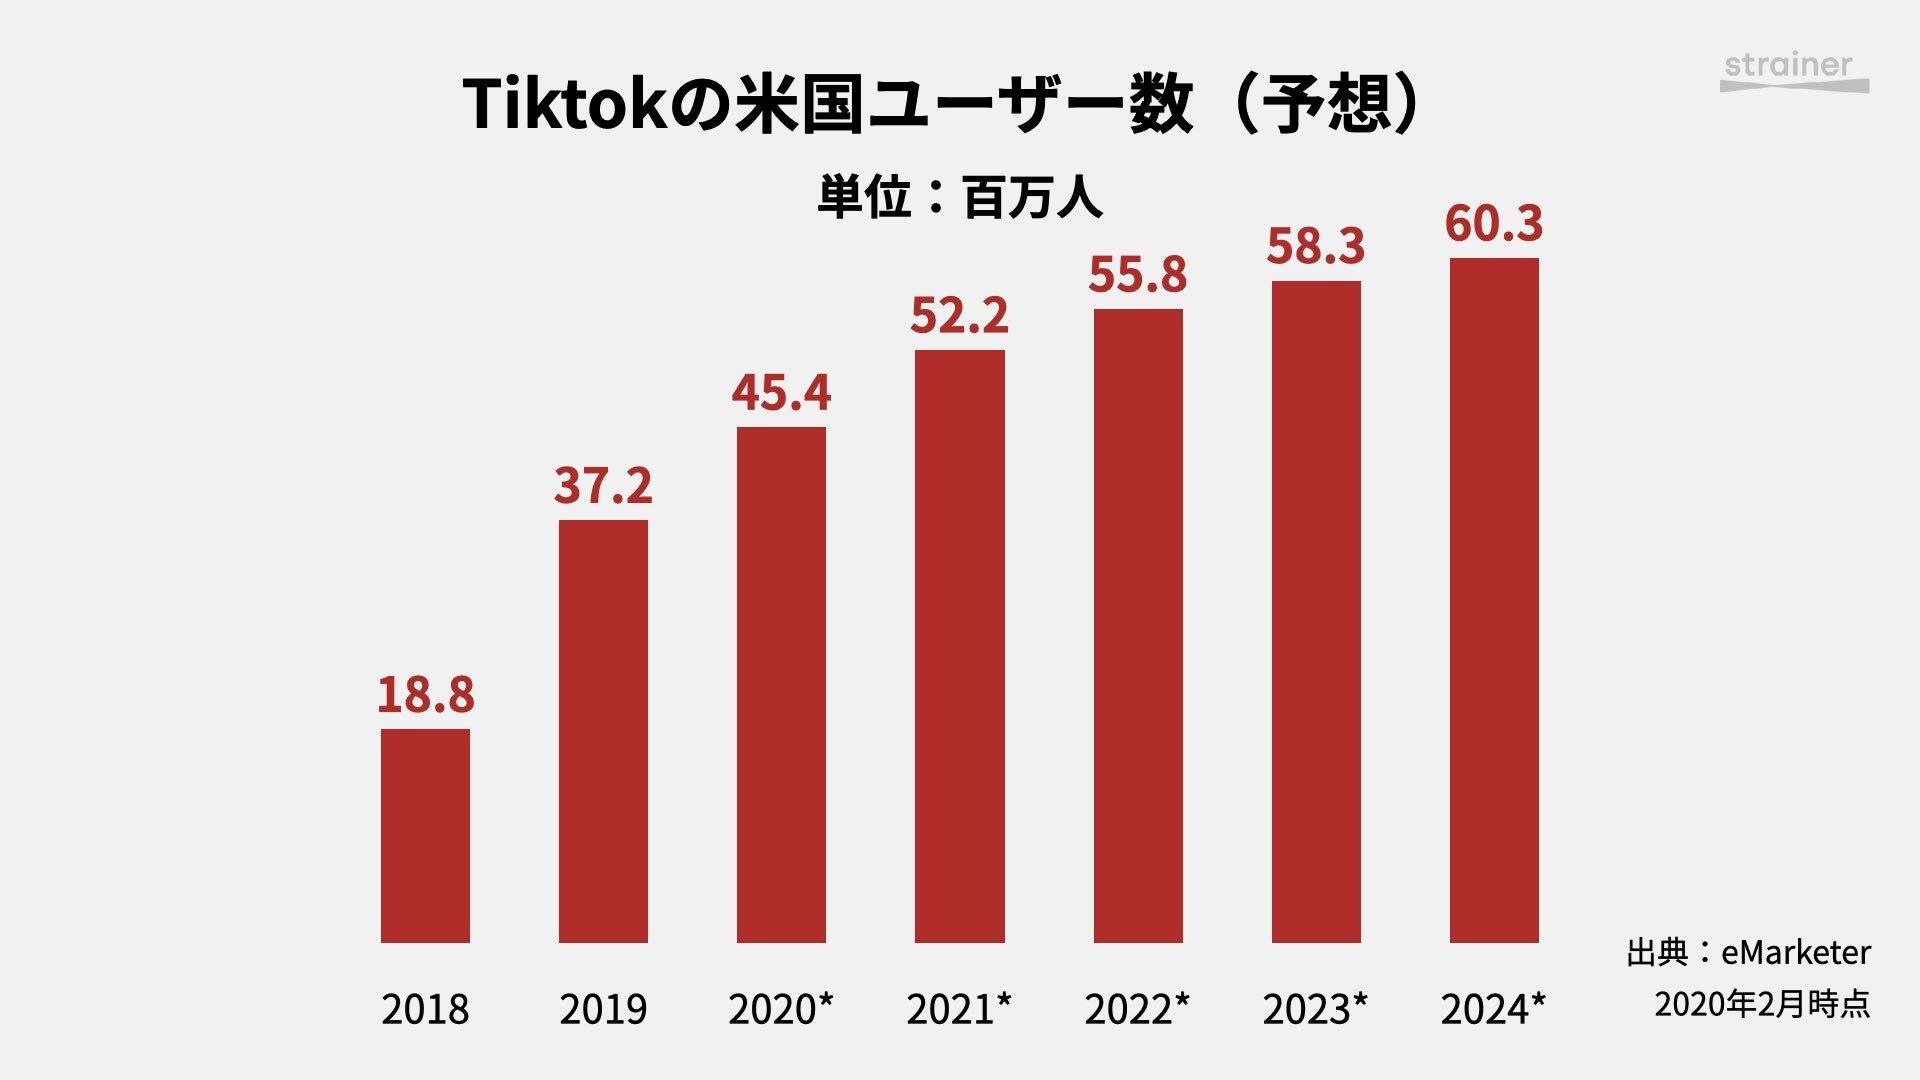 Tiktokの米国ユーザー数